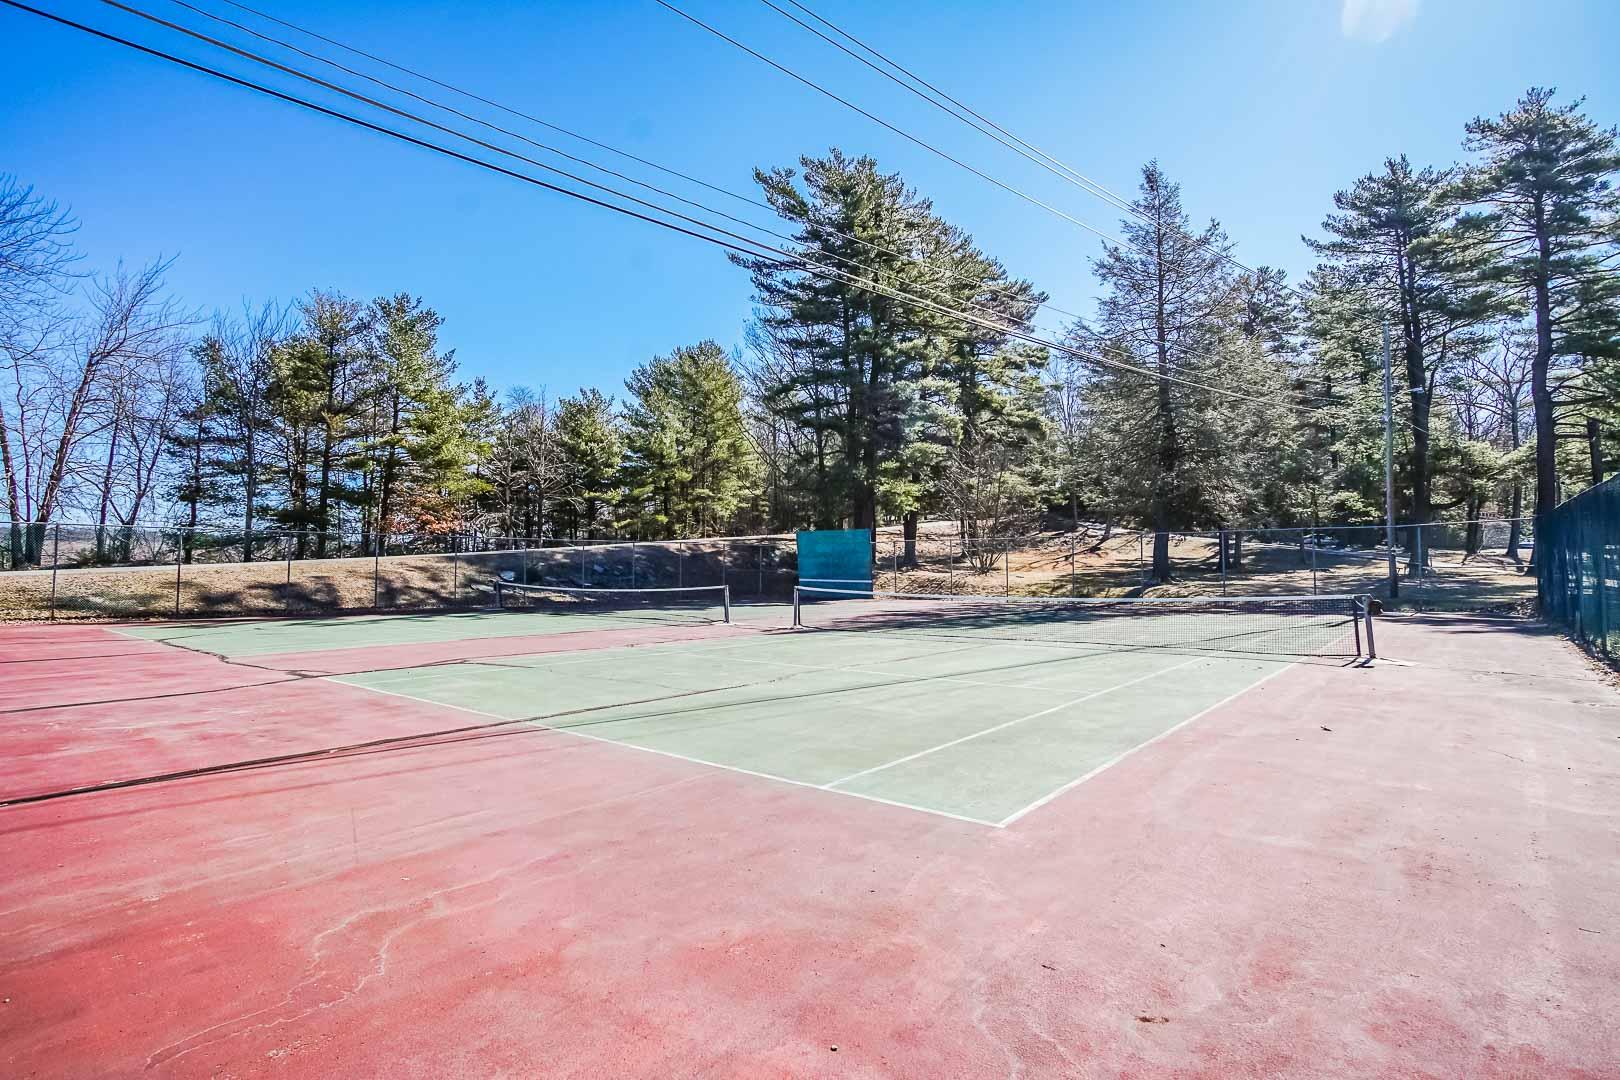 A n airy tennis court at VRI's Tanglwood Resort in Pennsylvania.